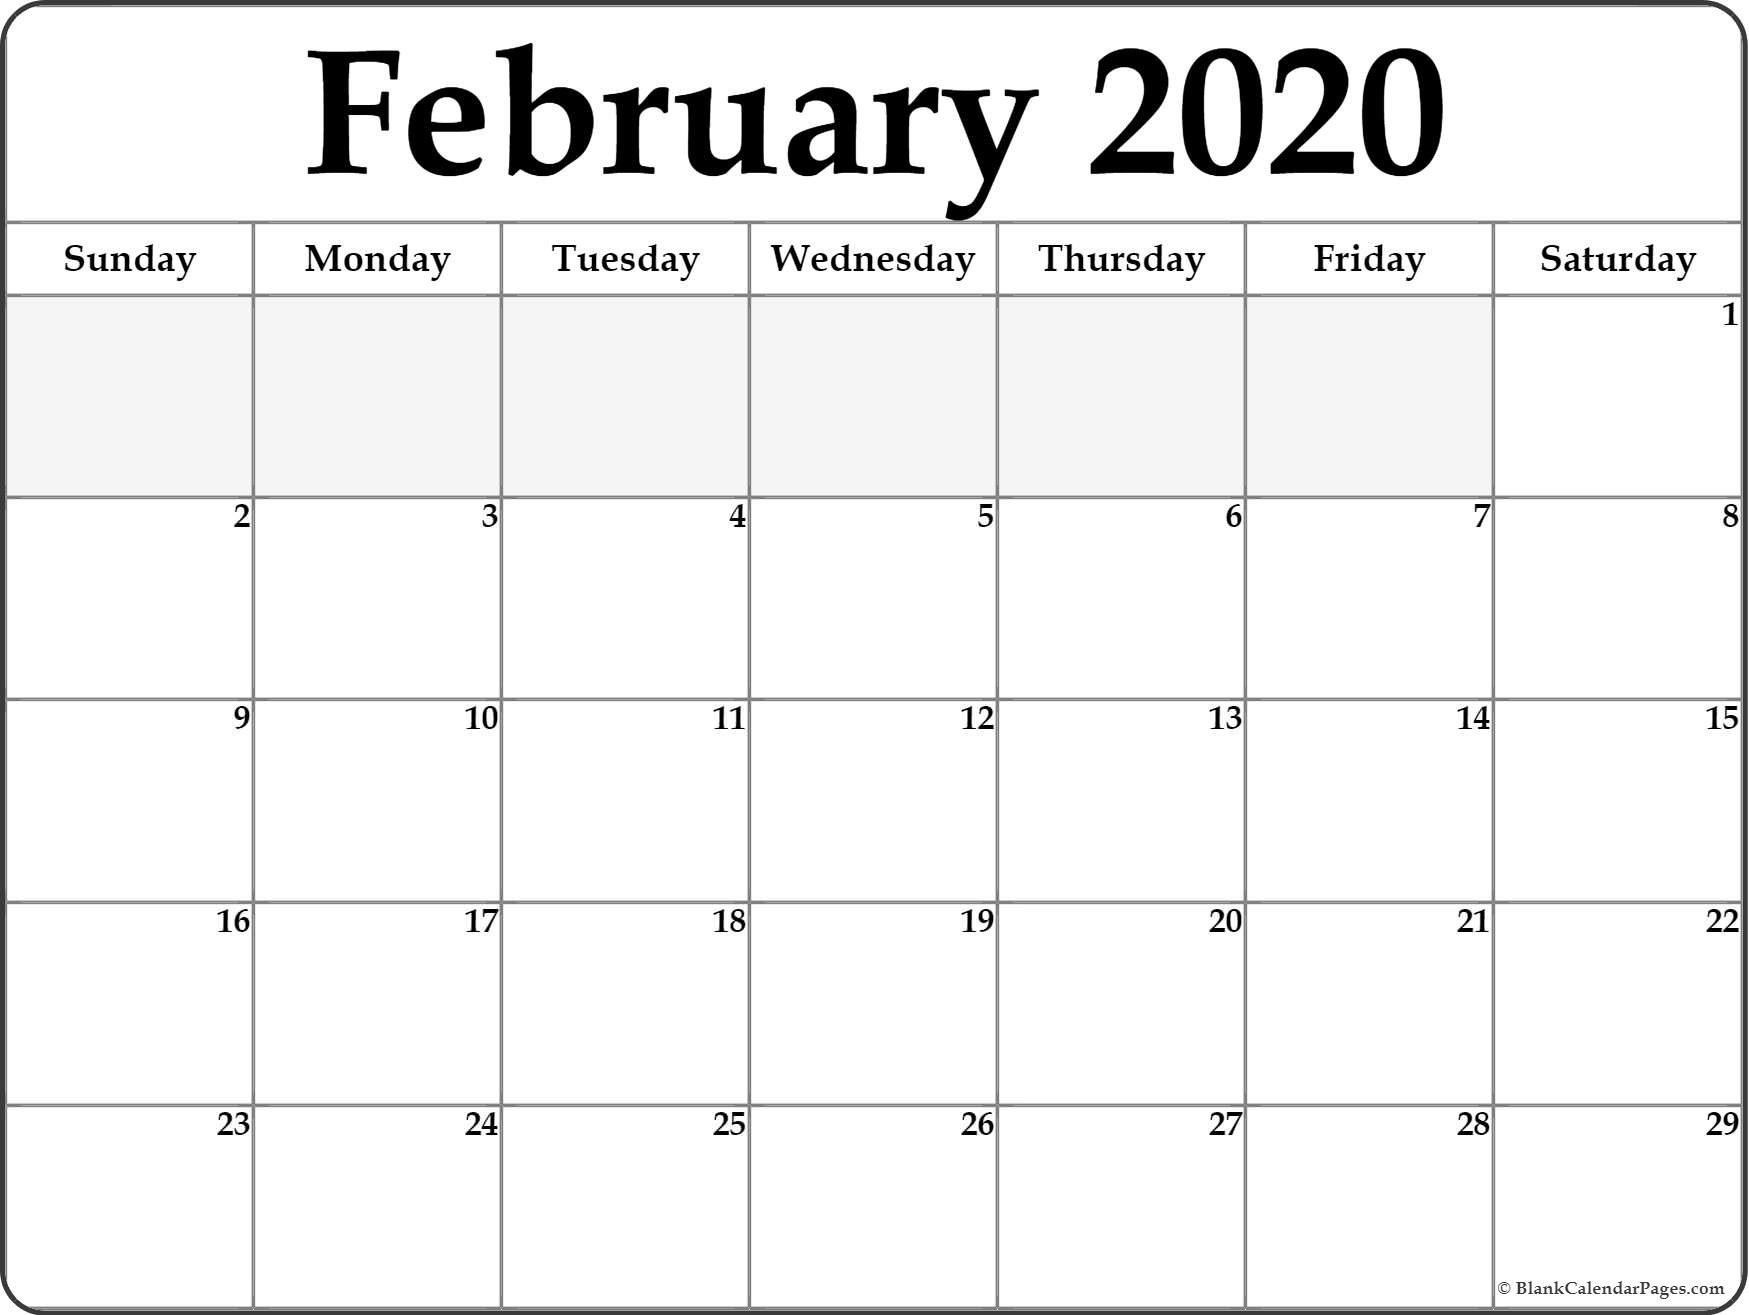 February 2020 Calendar | Free Printable Monthly Calendars-January And February 2020 Printable Calendar